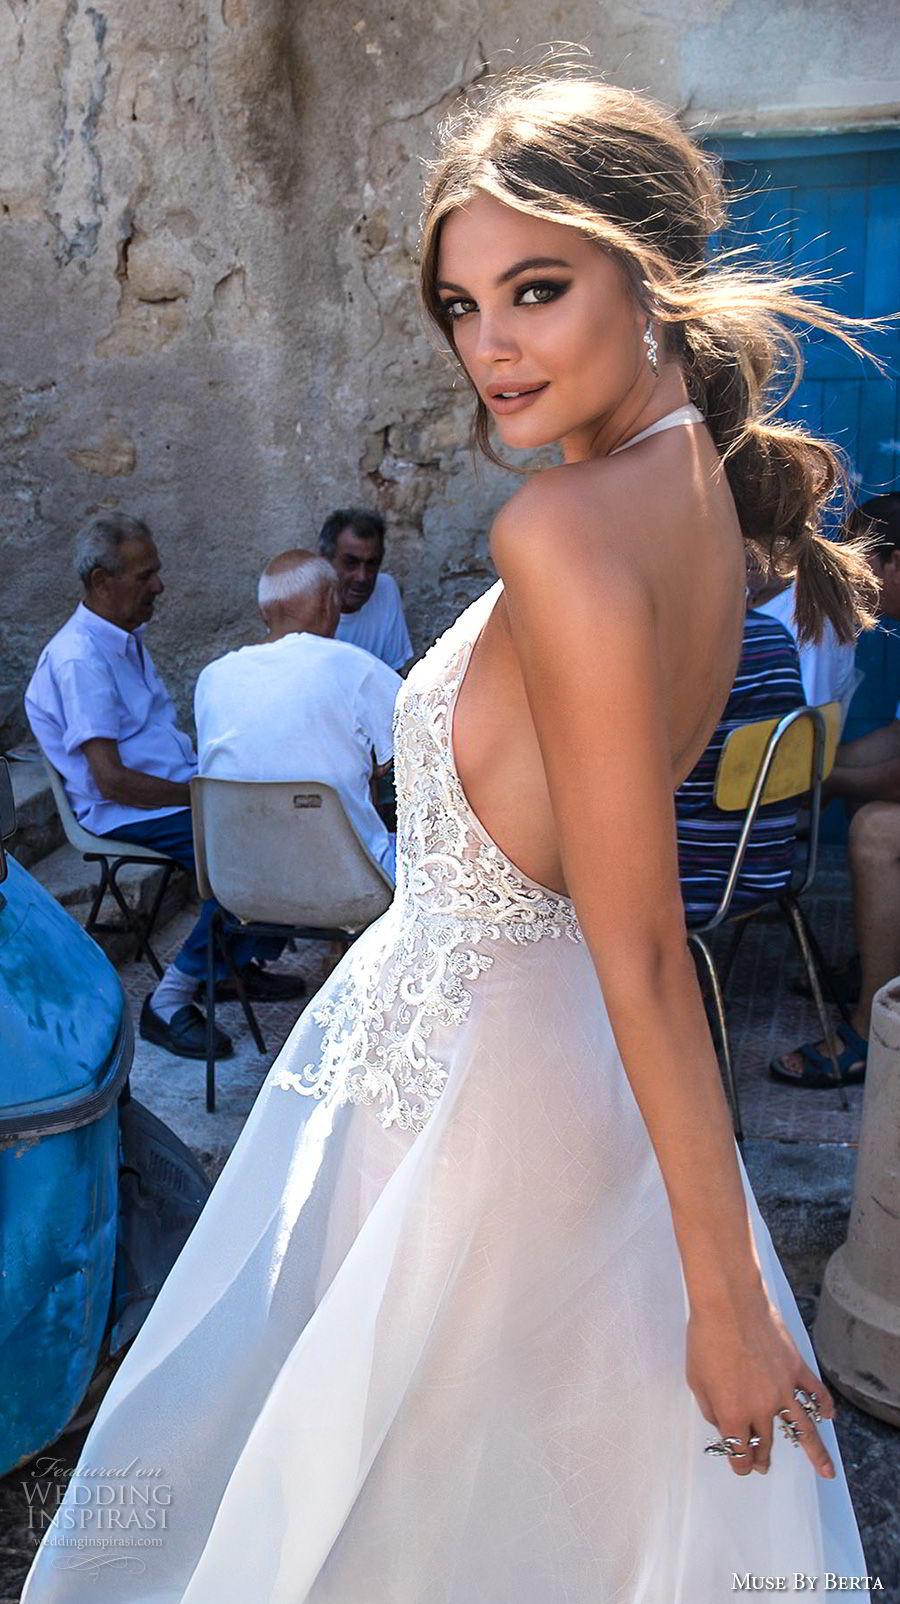 muse-berta-2018-bridal-sleeveless-deep-plunging-v-neck-heavily-embellished-bodice-sexy-elegant-sheath-wedding-dress-a-line-overskirt-open-back-chapel-train-10-zbv